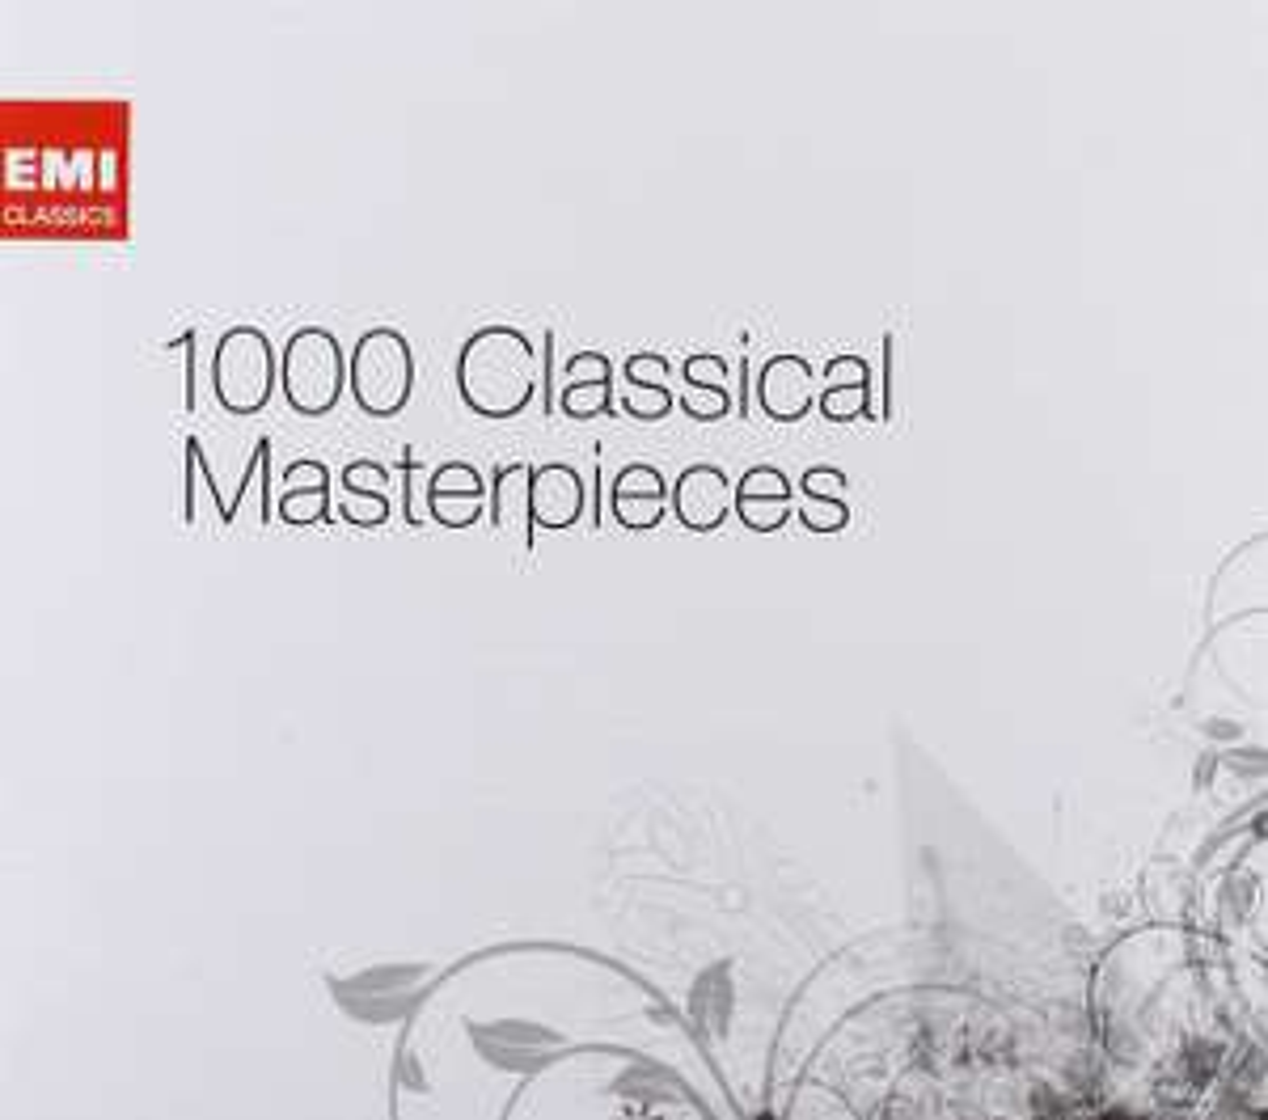 Coffret 61 CD 1000 Classical Masterpieces